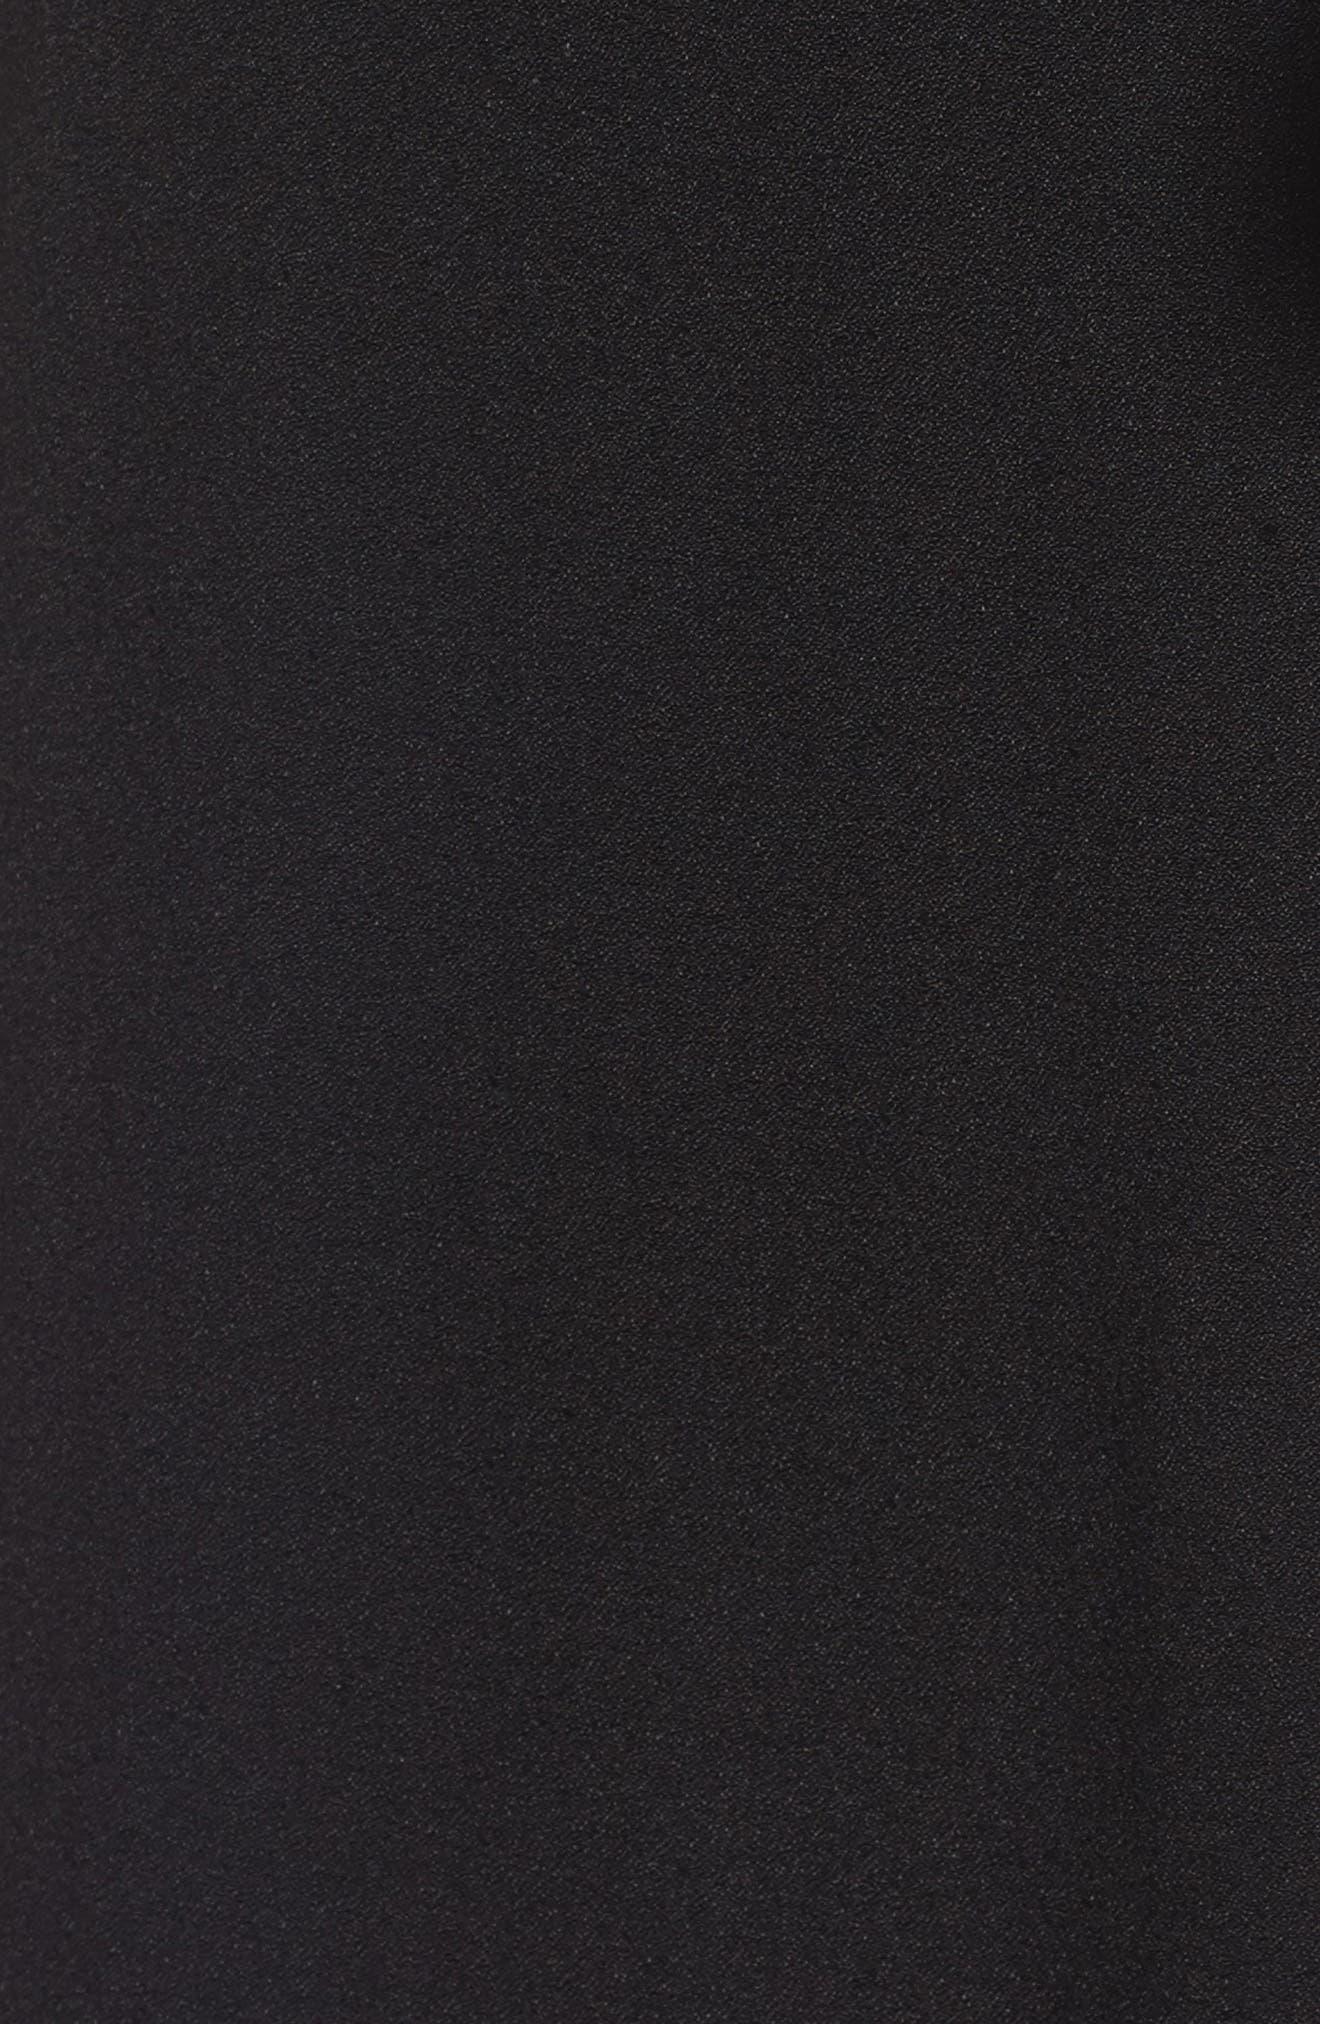 Amelia Ruffle Wrap Skirt,                             Alternate thumbnail 5, color,                             001